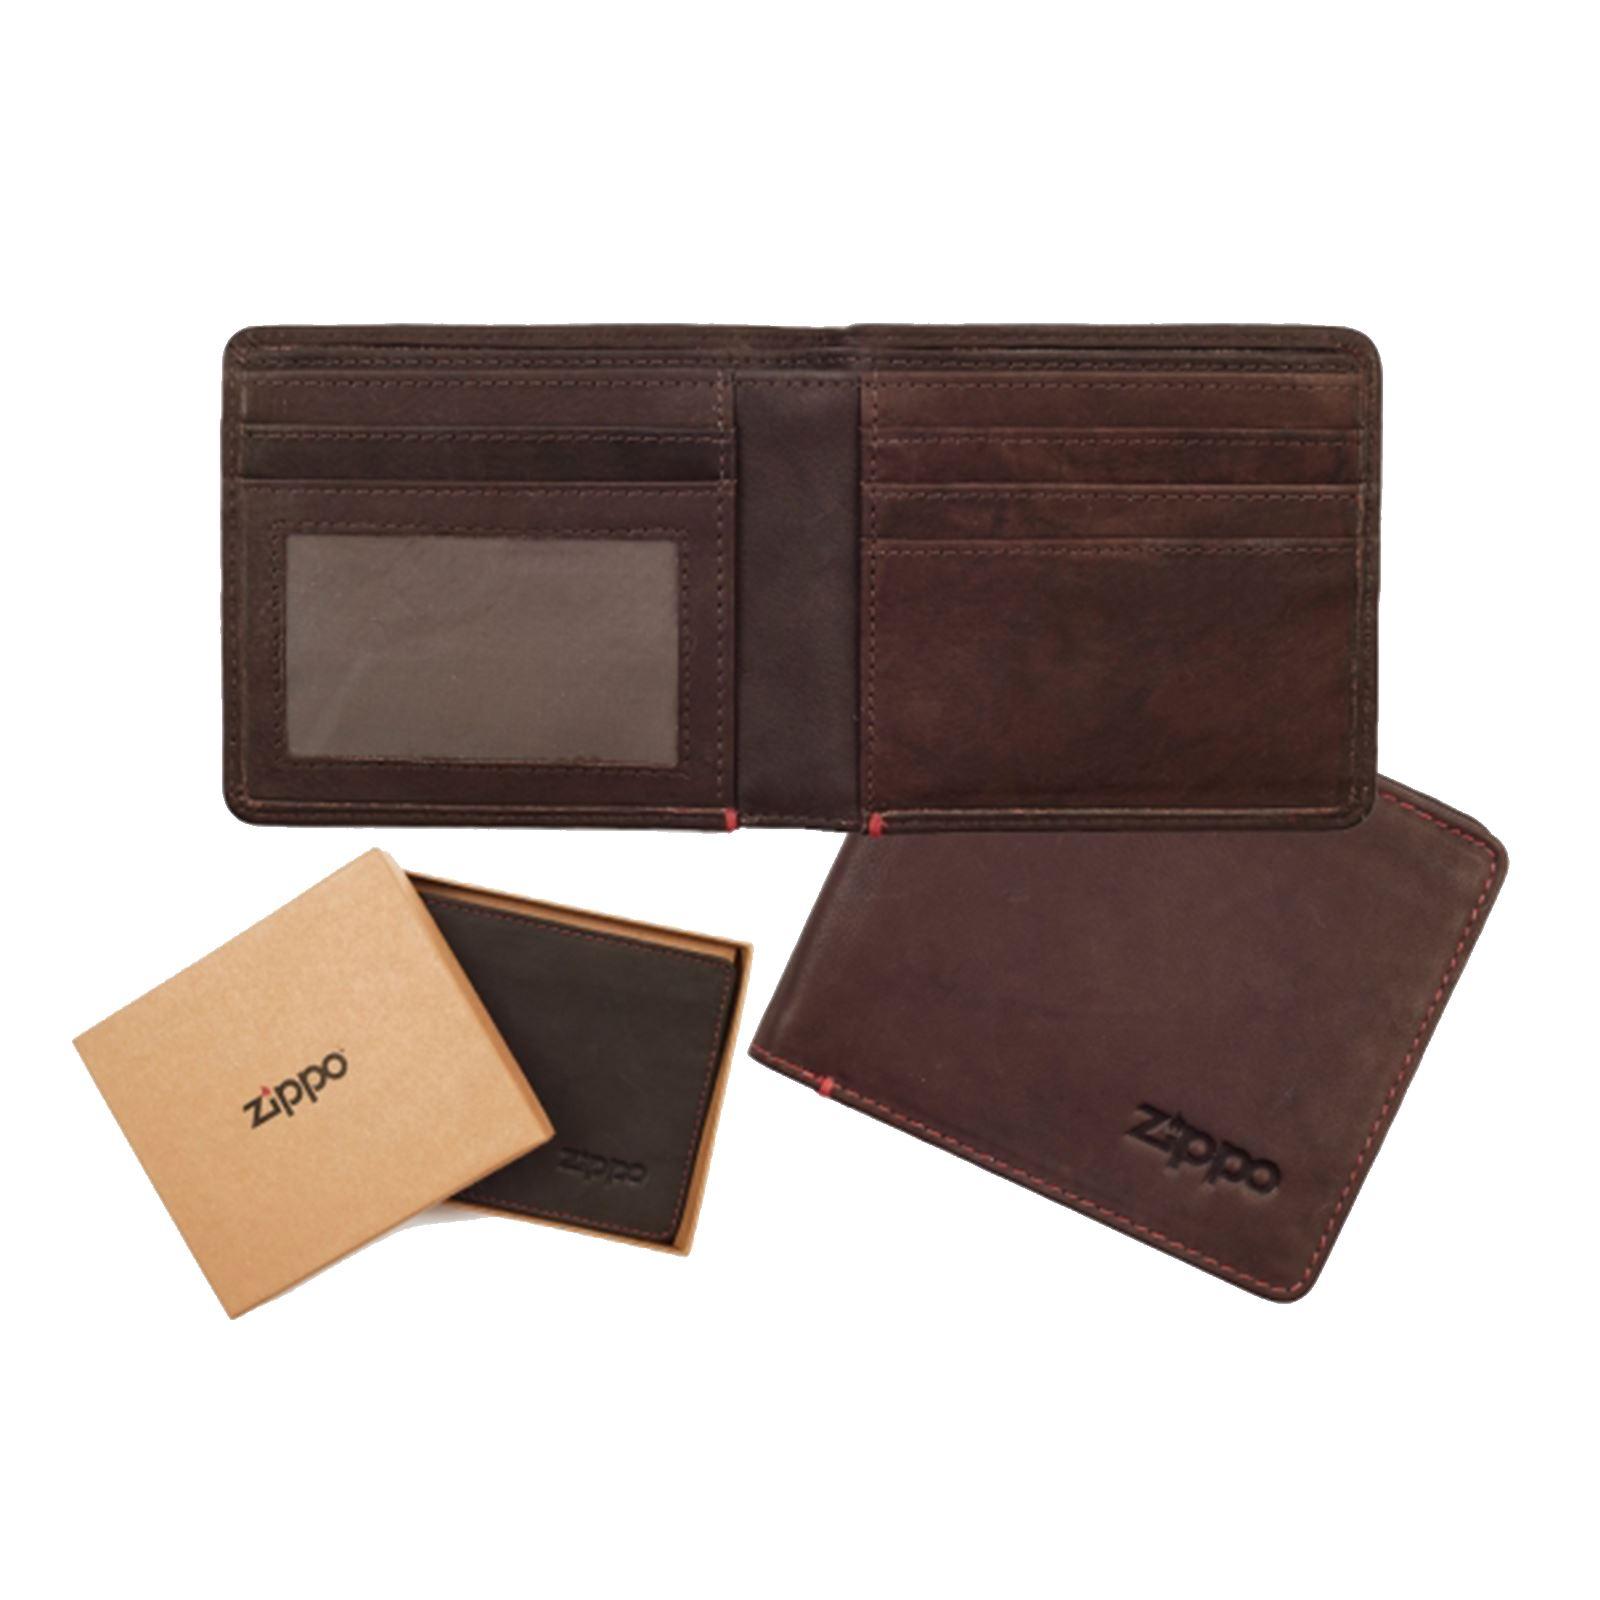 Gentlemens Hardware Leather Canvas Slim Bi-Fold Wallet